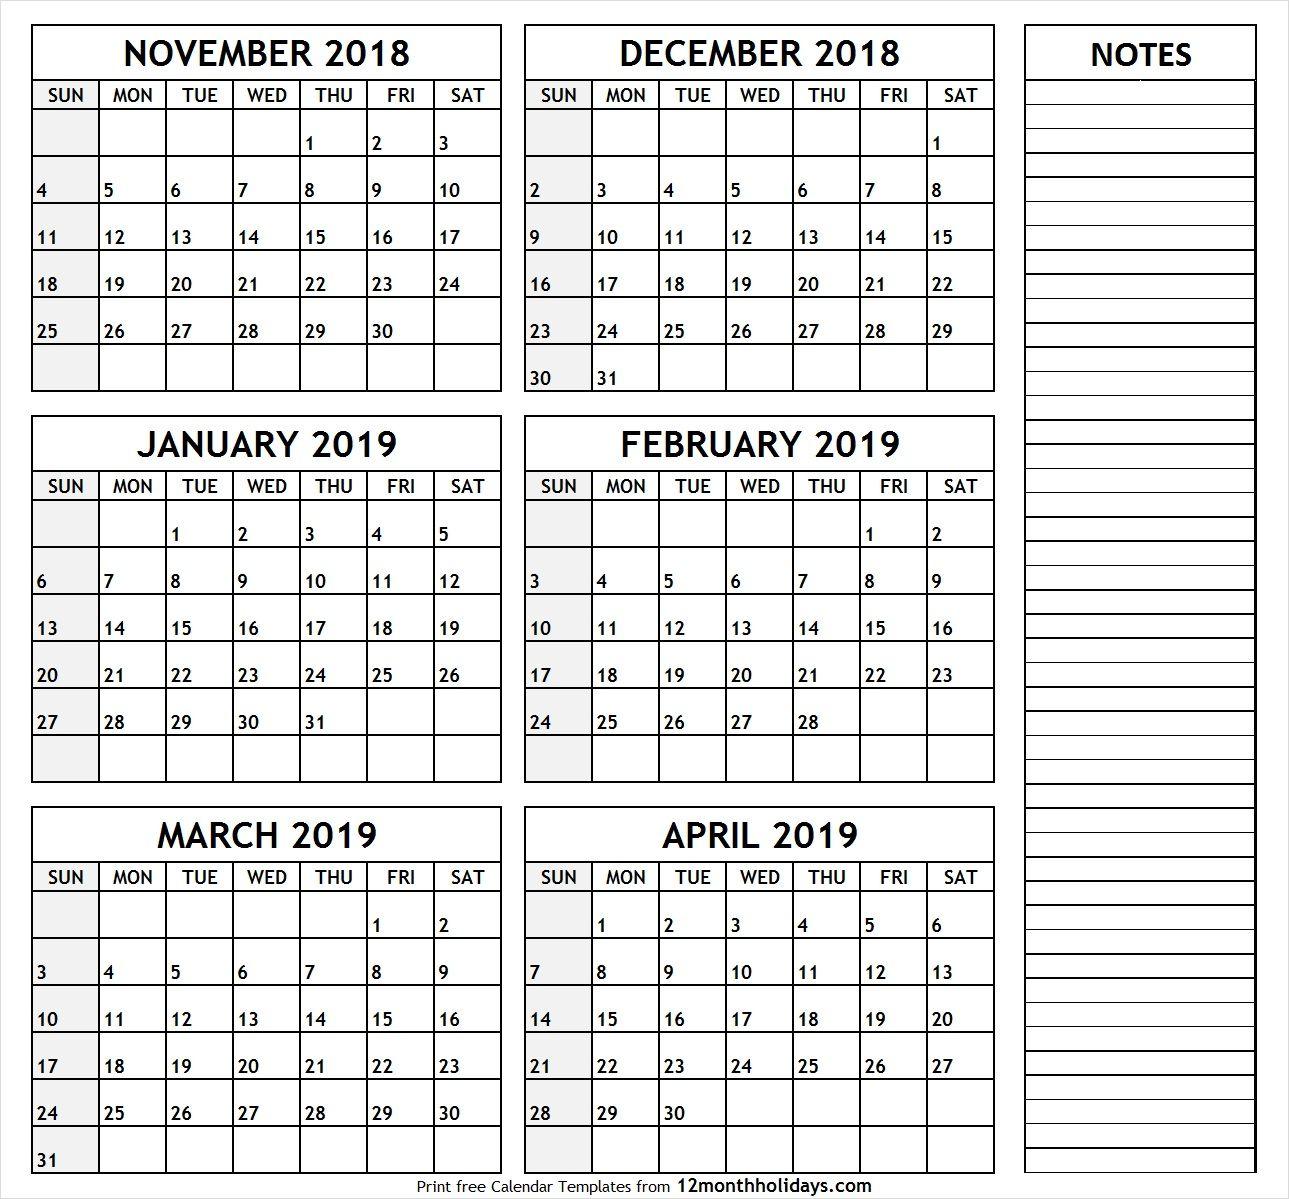 Printable Calendar November 2018  April 2019 | November intended for Printable Six Month Calendar